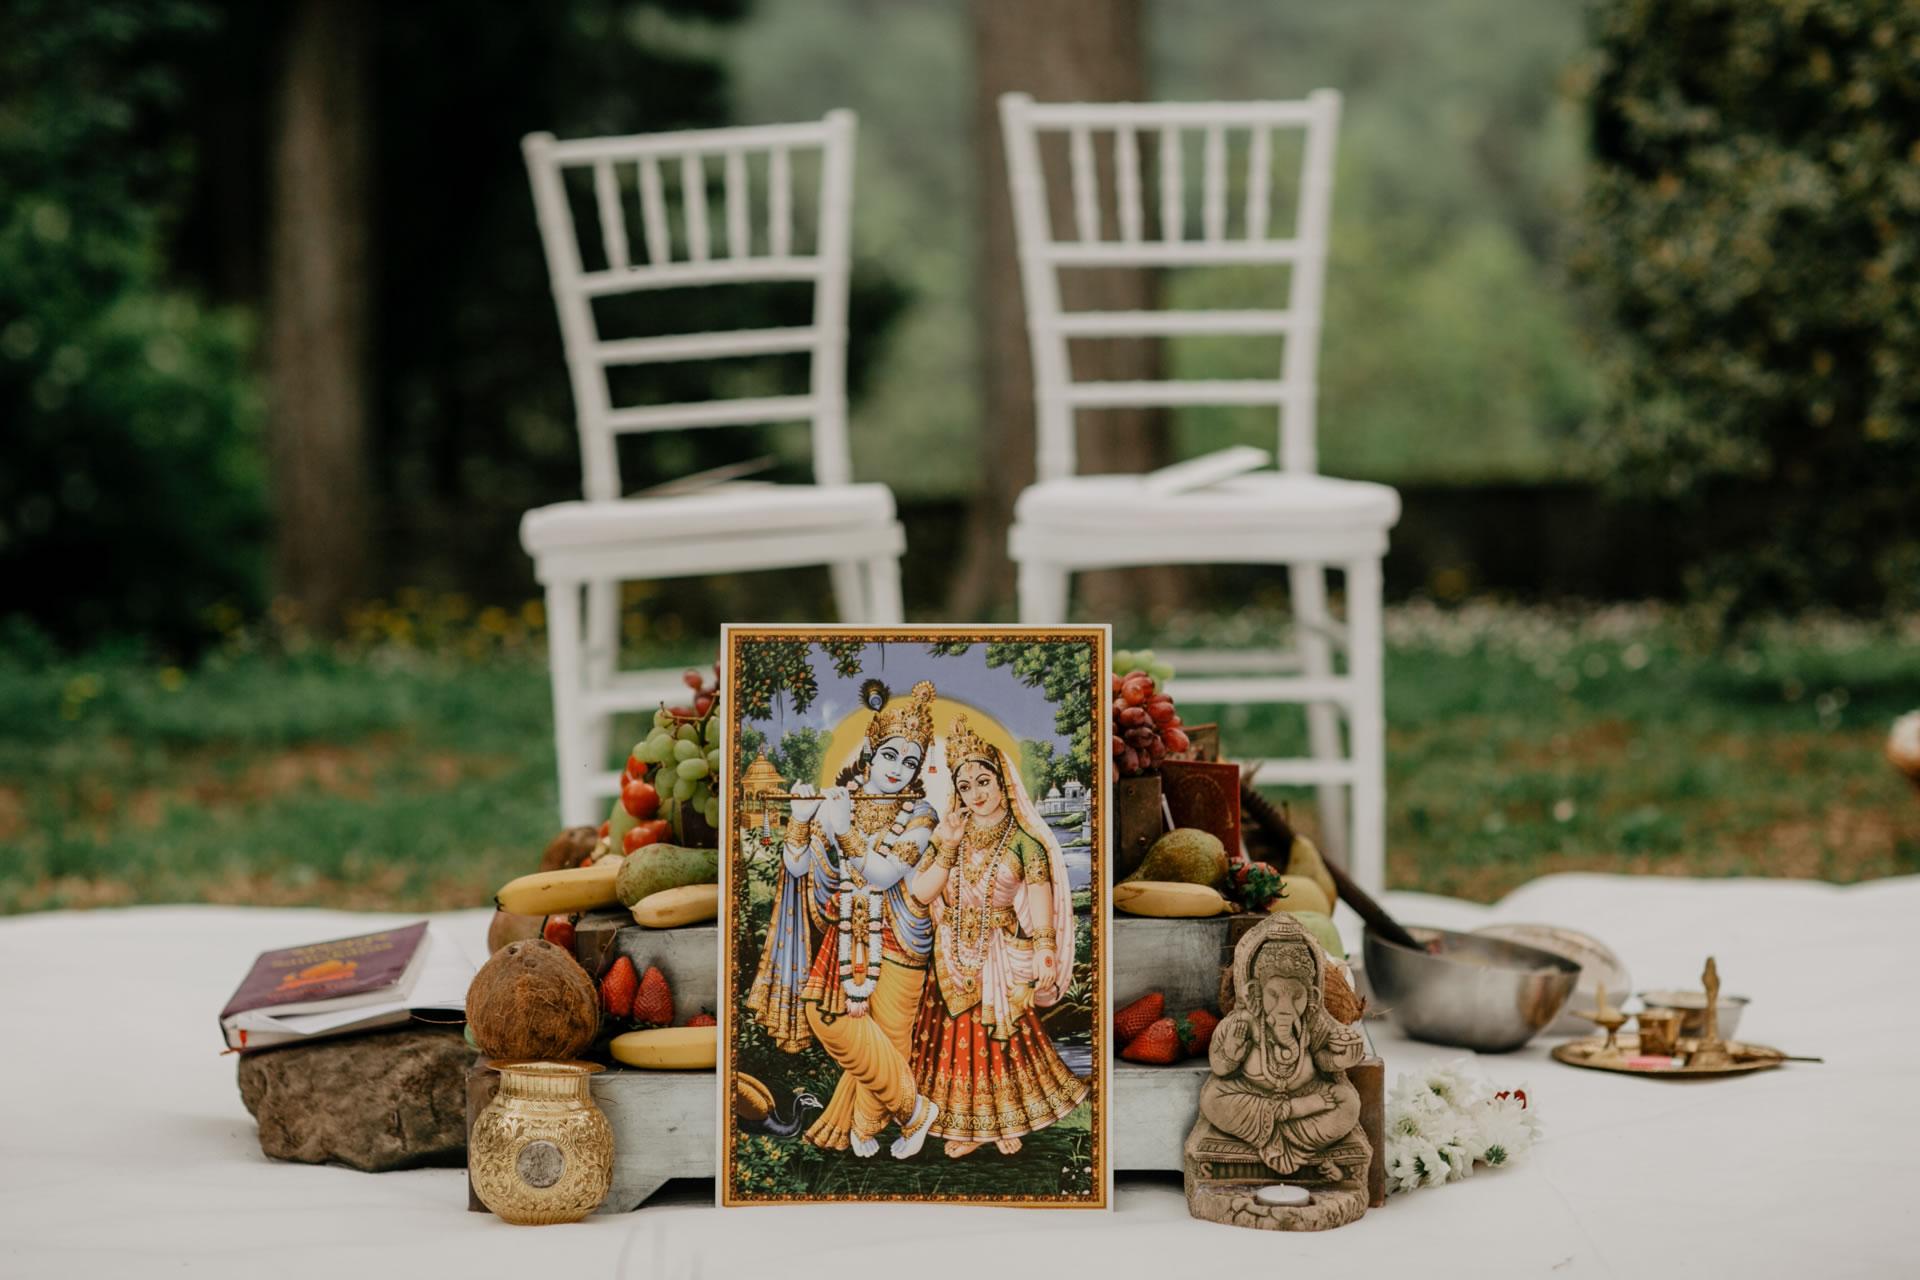 - 15 :: Indian wedding ceremony at Villa Pitiana :: Luxury wedding photography - 14 ::  - 15